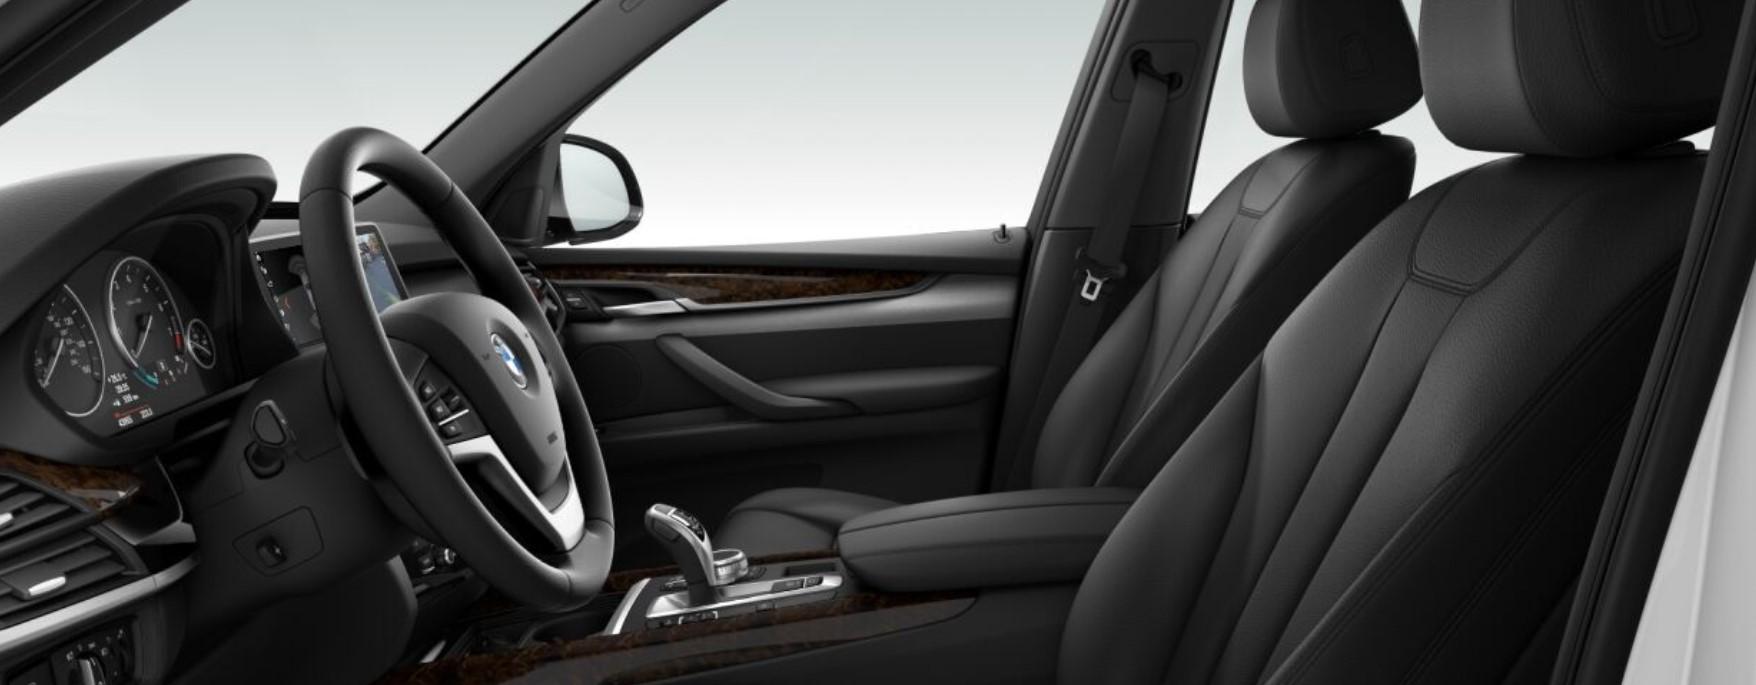 Bmw X5 Interior mid size luxury suv - idokeren.com